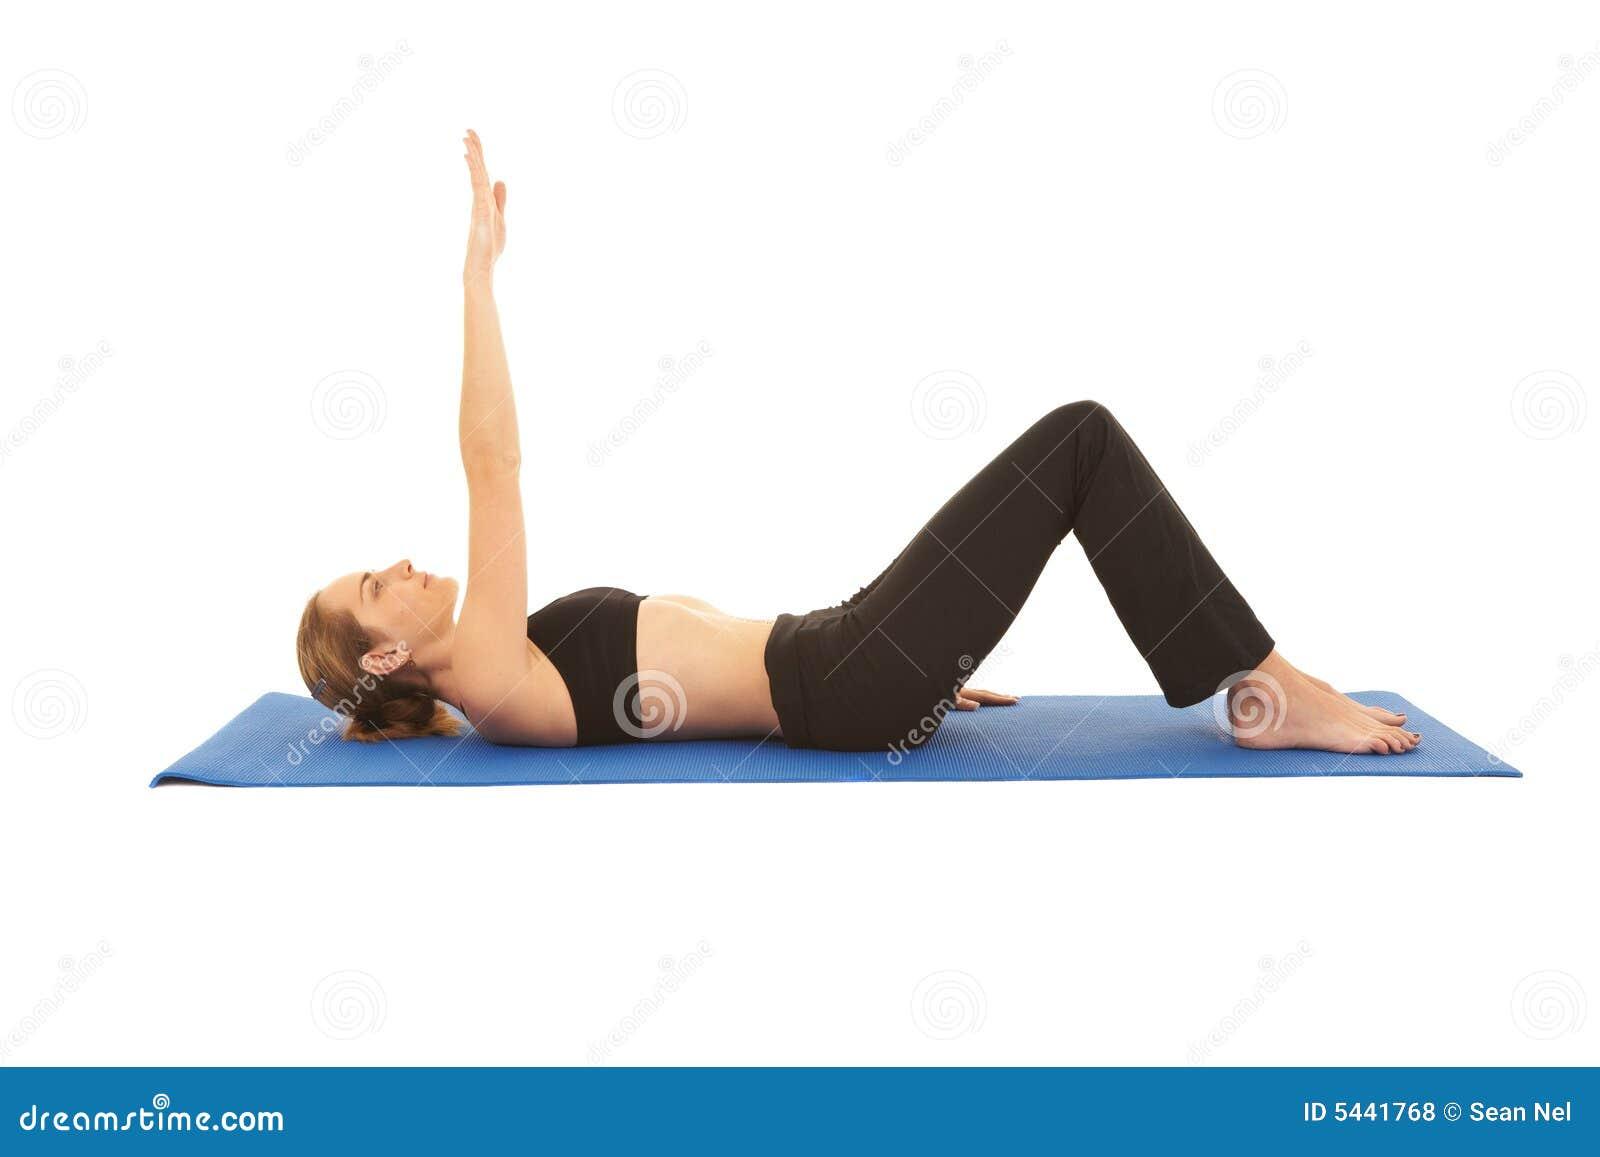 Pilates Exercise Series Royalty Free Stock Photos Image